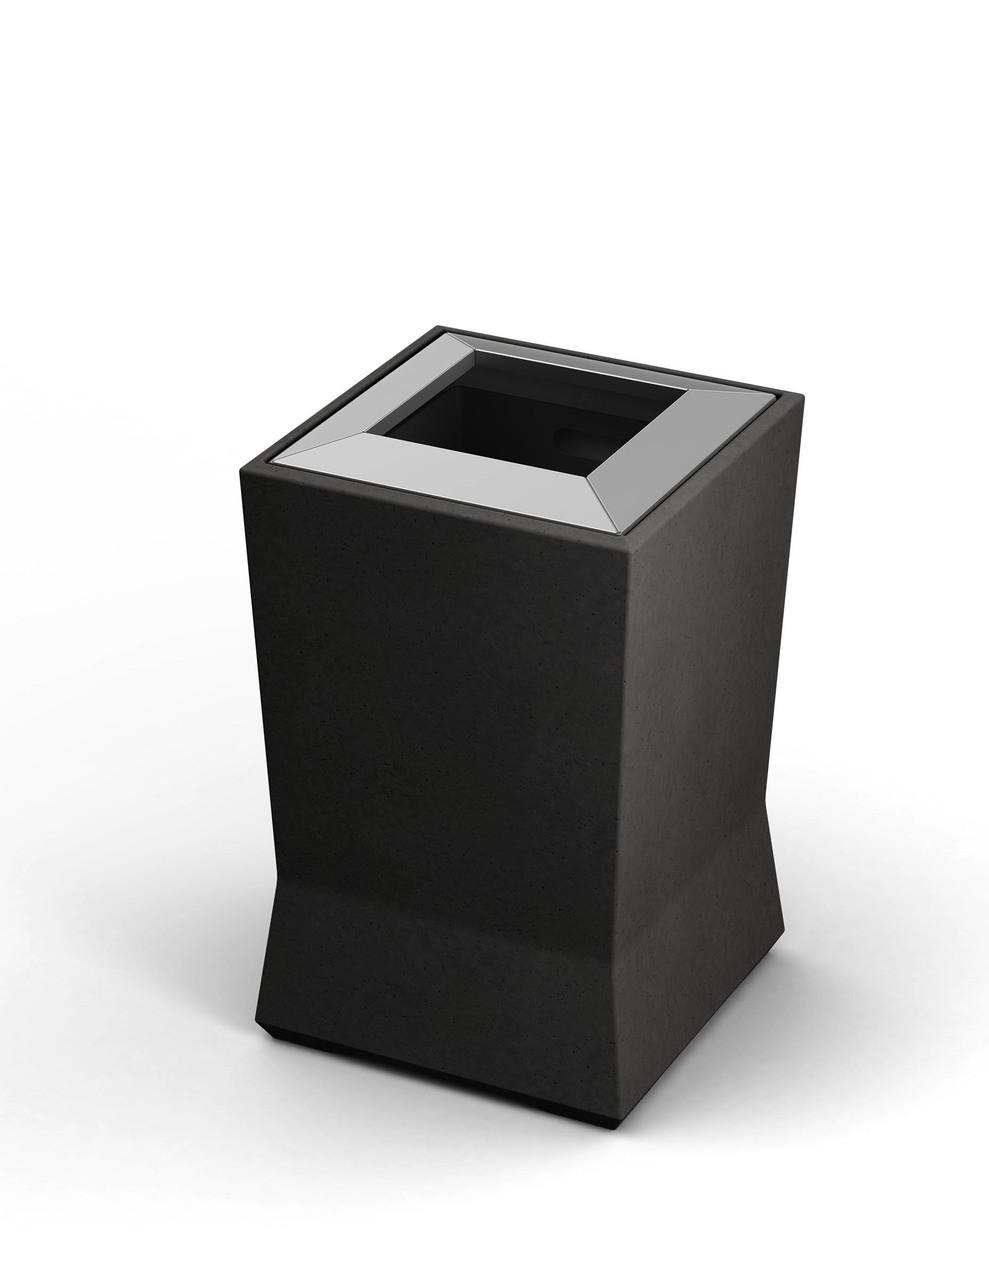 20 Gallon ModTec Plastic & Steel Designer Trash Can 724566 Gunmetal Satin